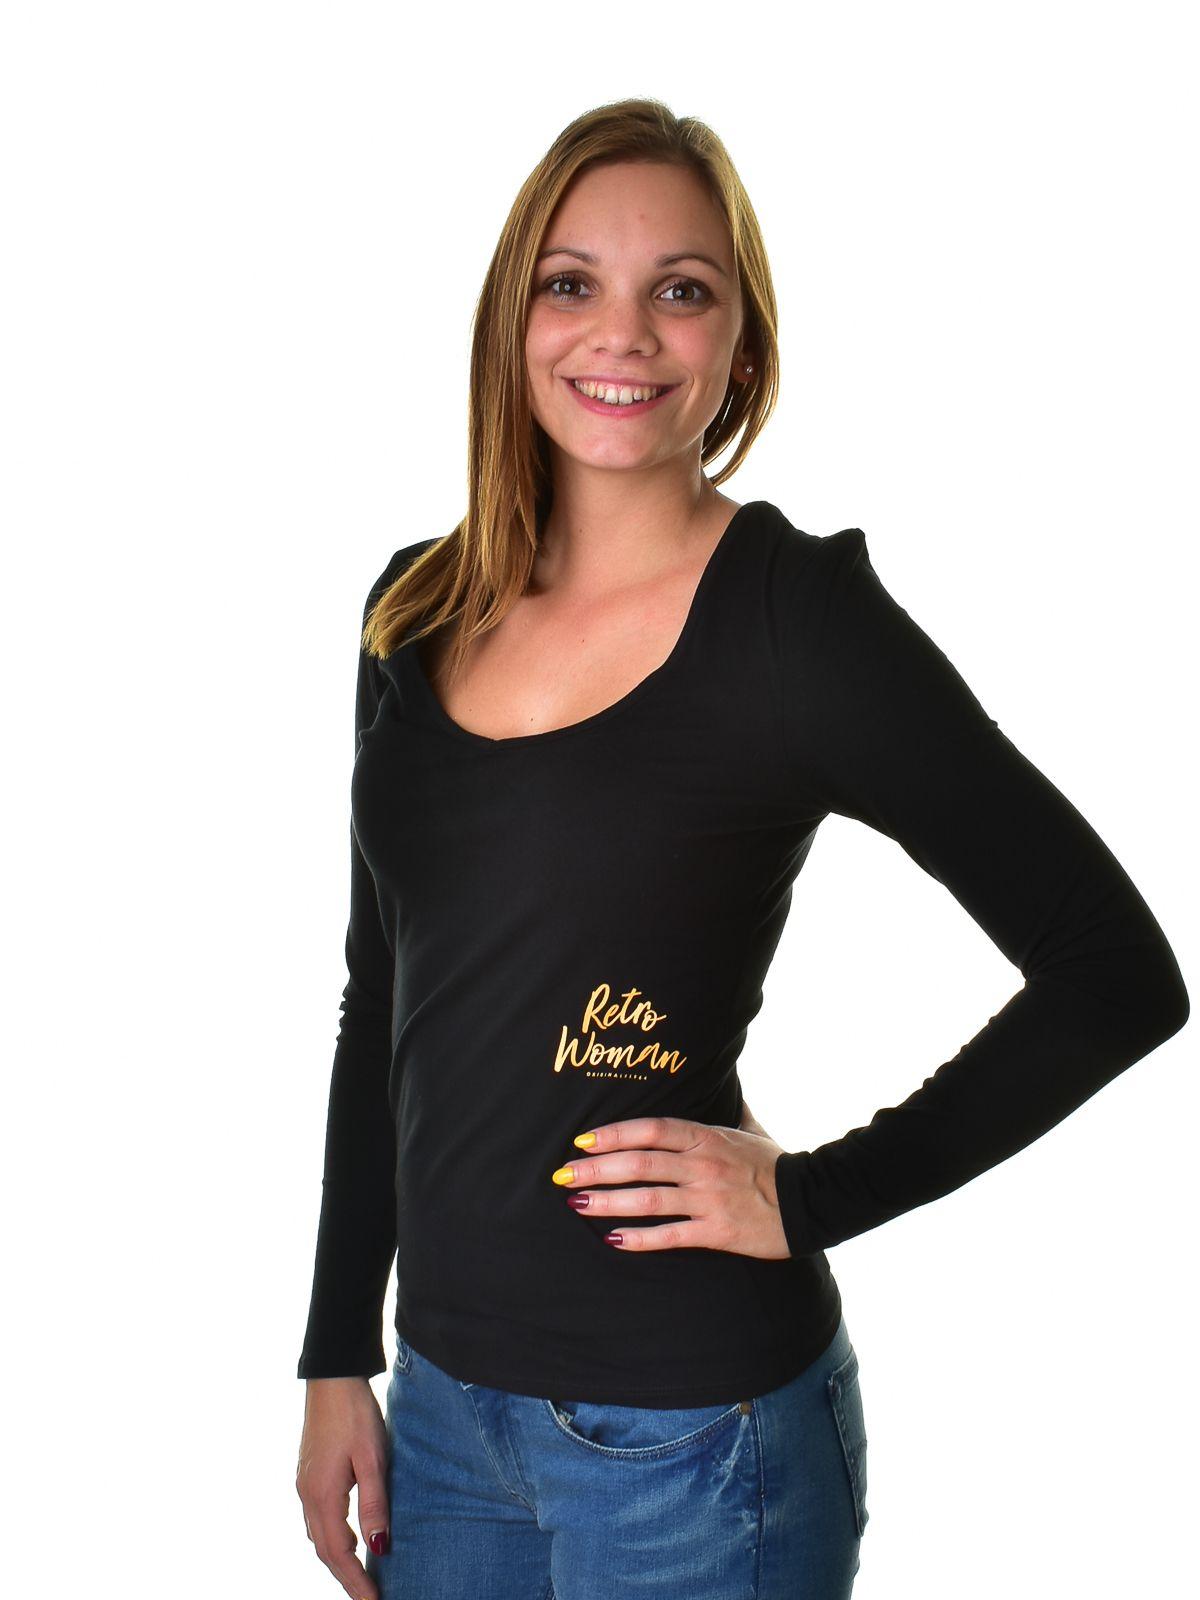 0d80fd1e90 Retro Jeans női póló ALDINA FASHION TOP | Markasbolt.hu Hivatalos ...